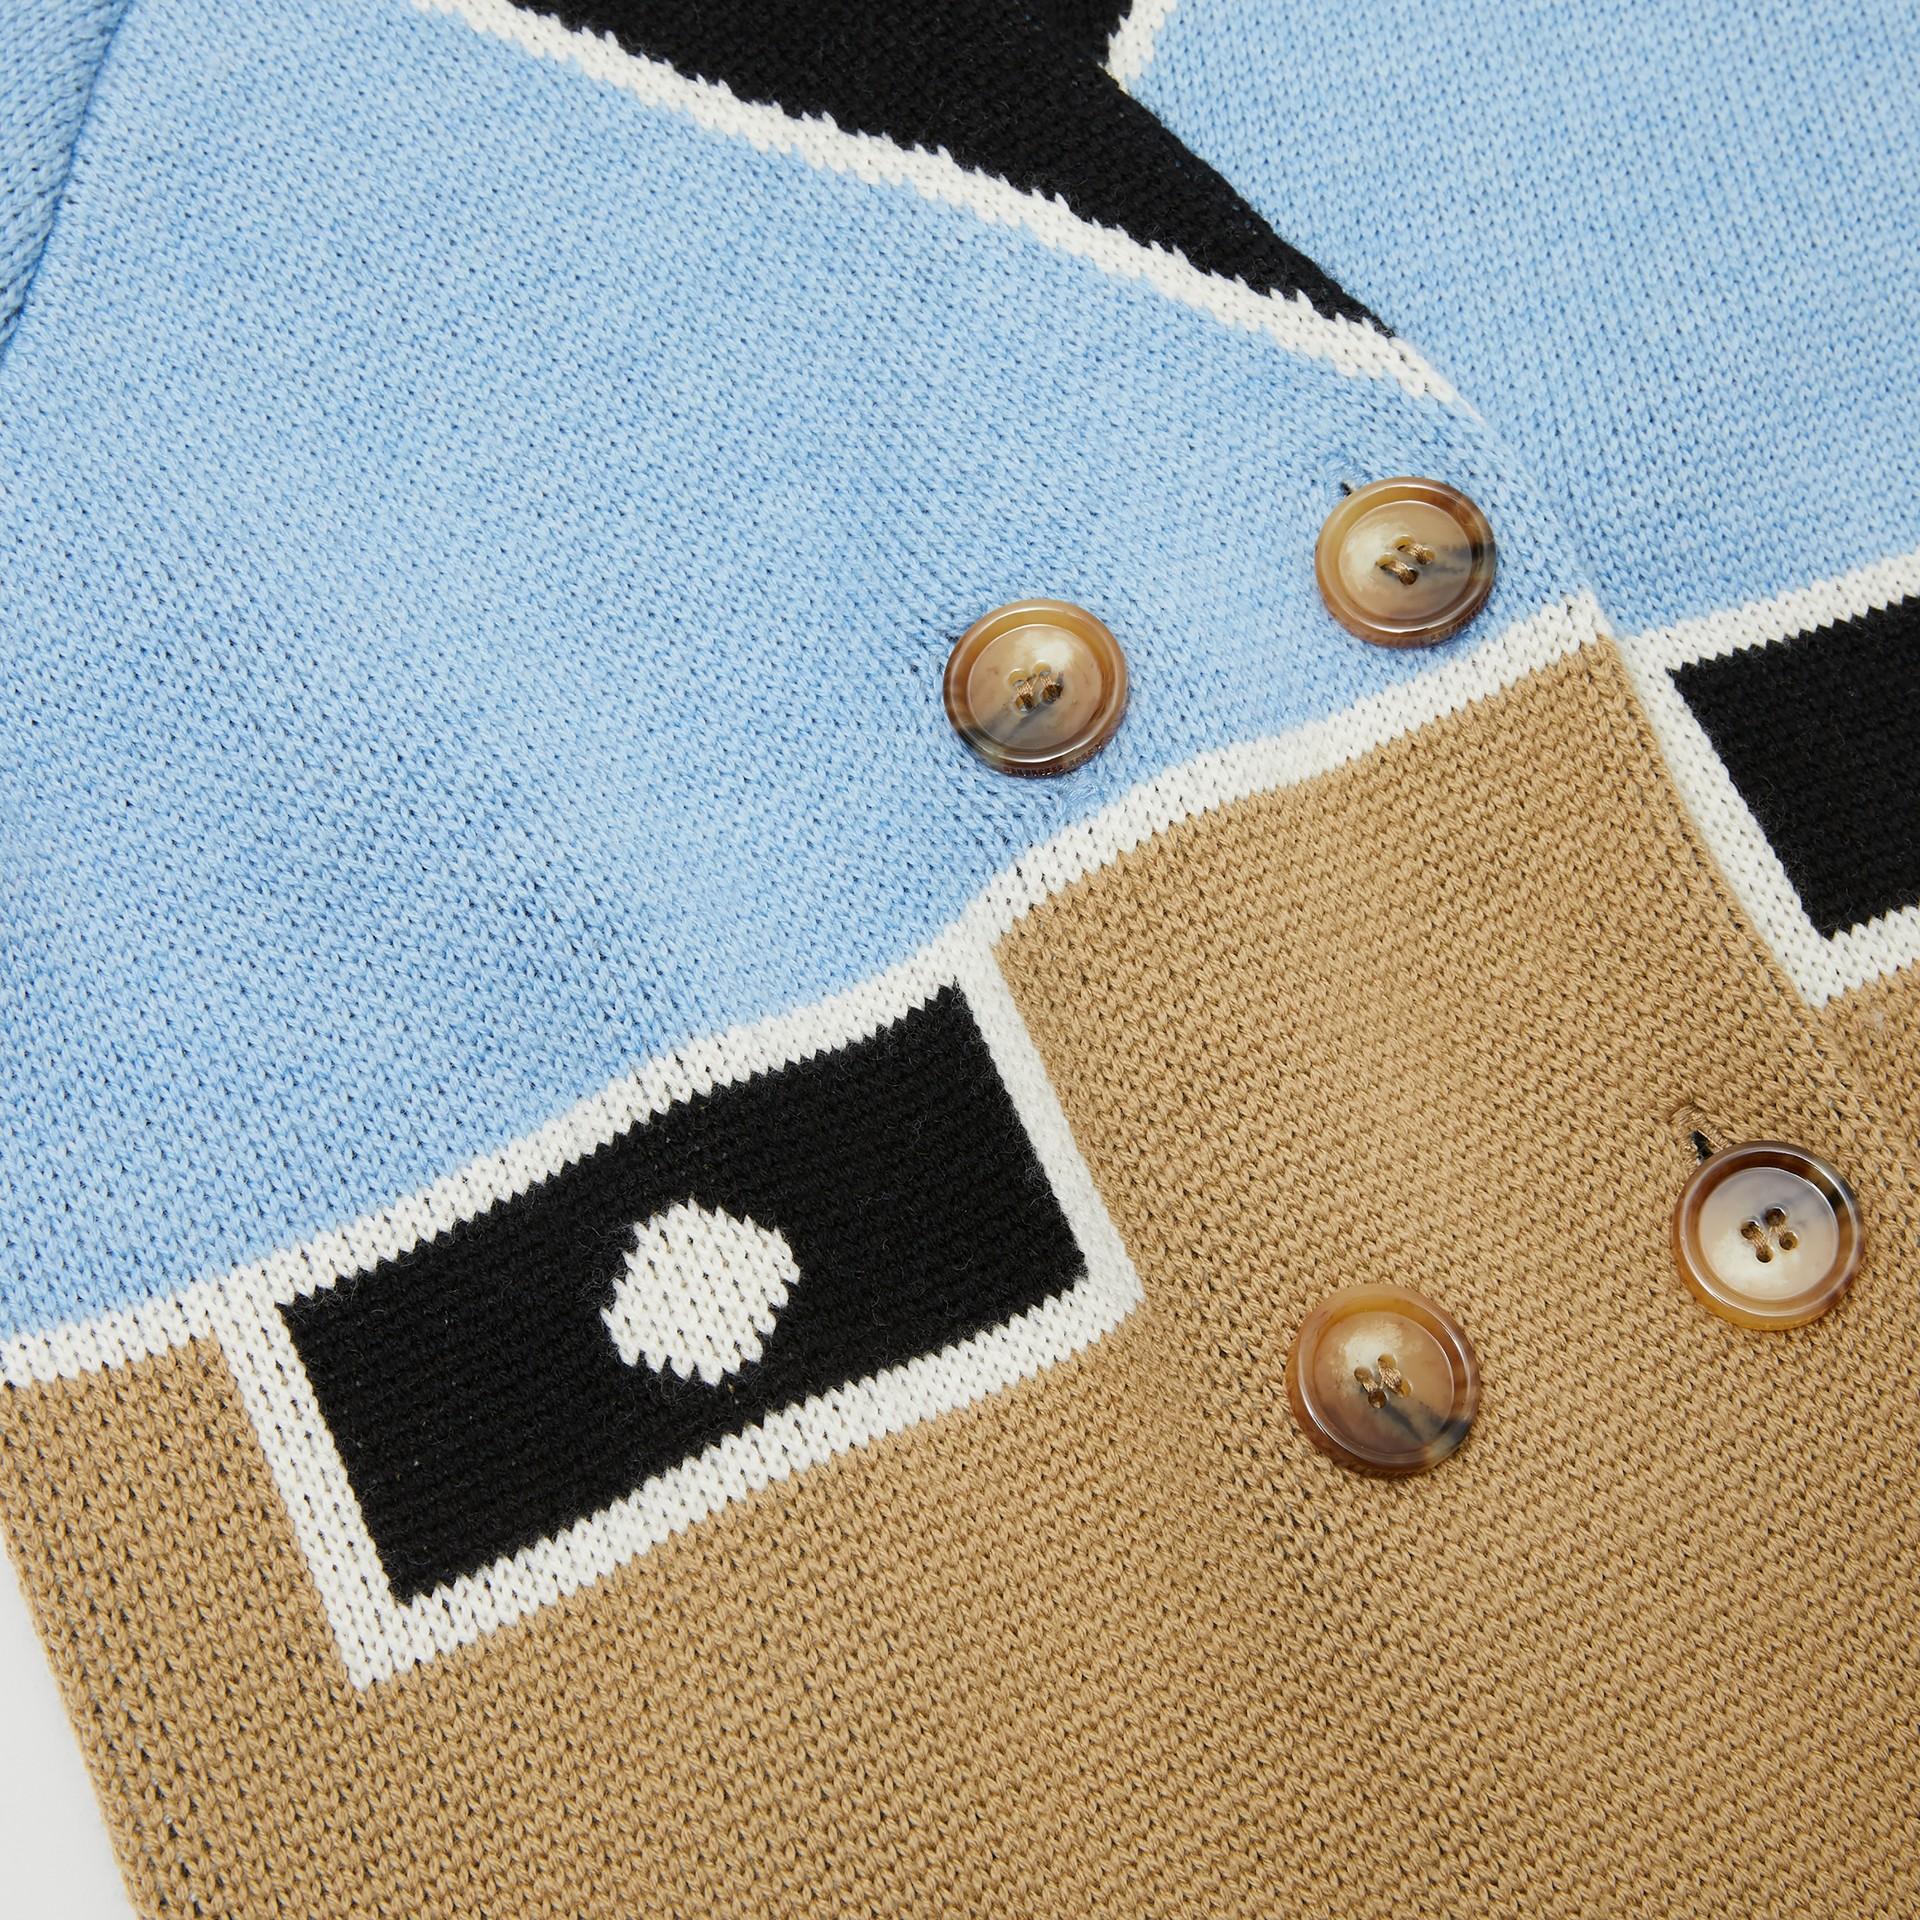 Trompe L'Oeil Intarsia Wool Coat in Dusty Blue   Burberry United Kingdom - gallery image 1